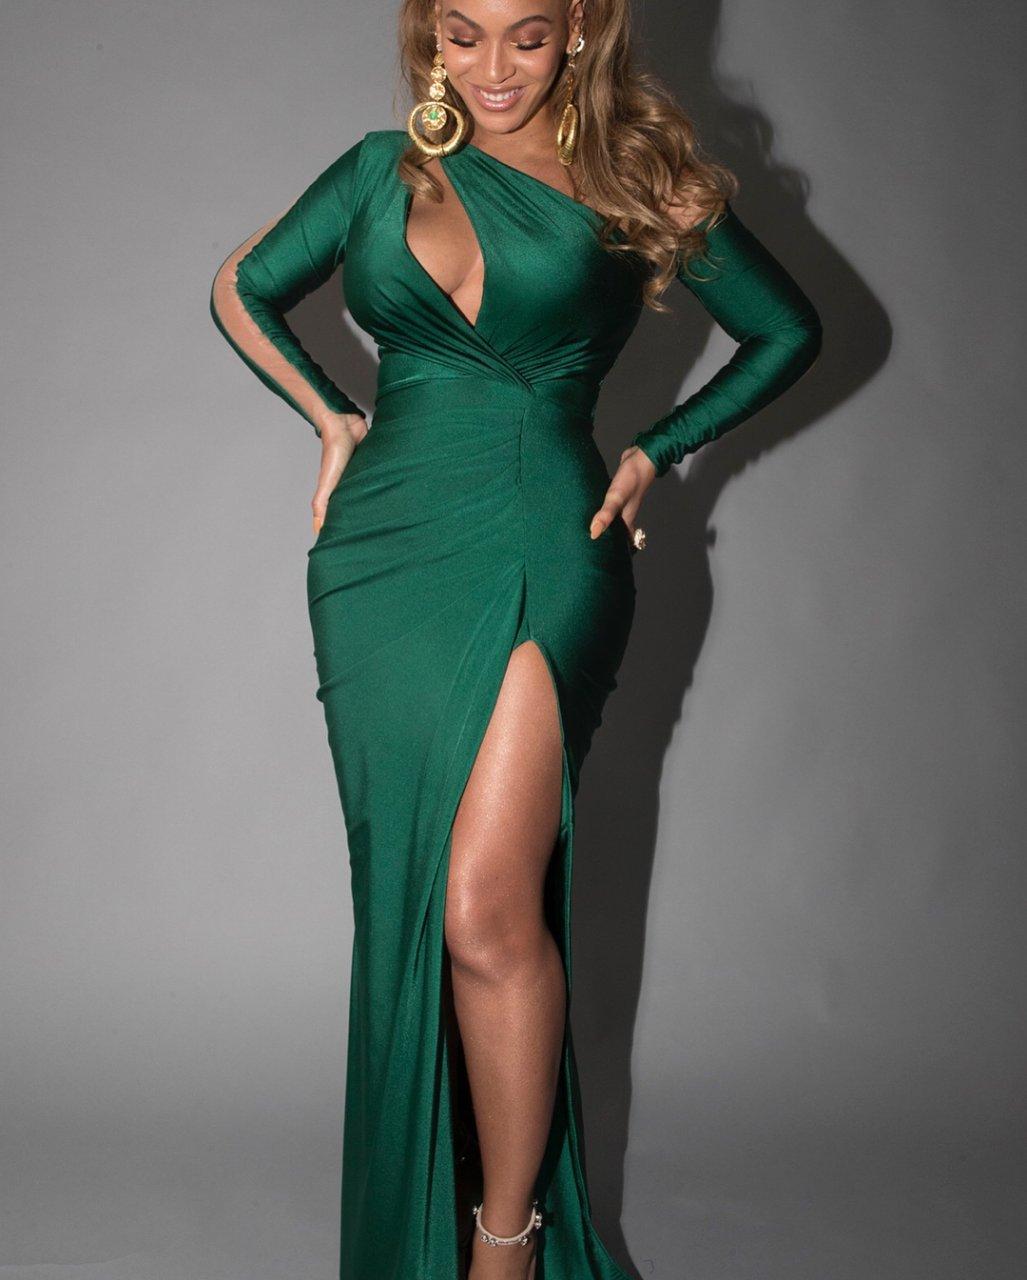 5 Bootylicious Women Who Look Like Beyonce  Made Man